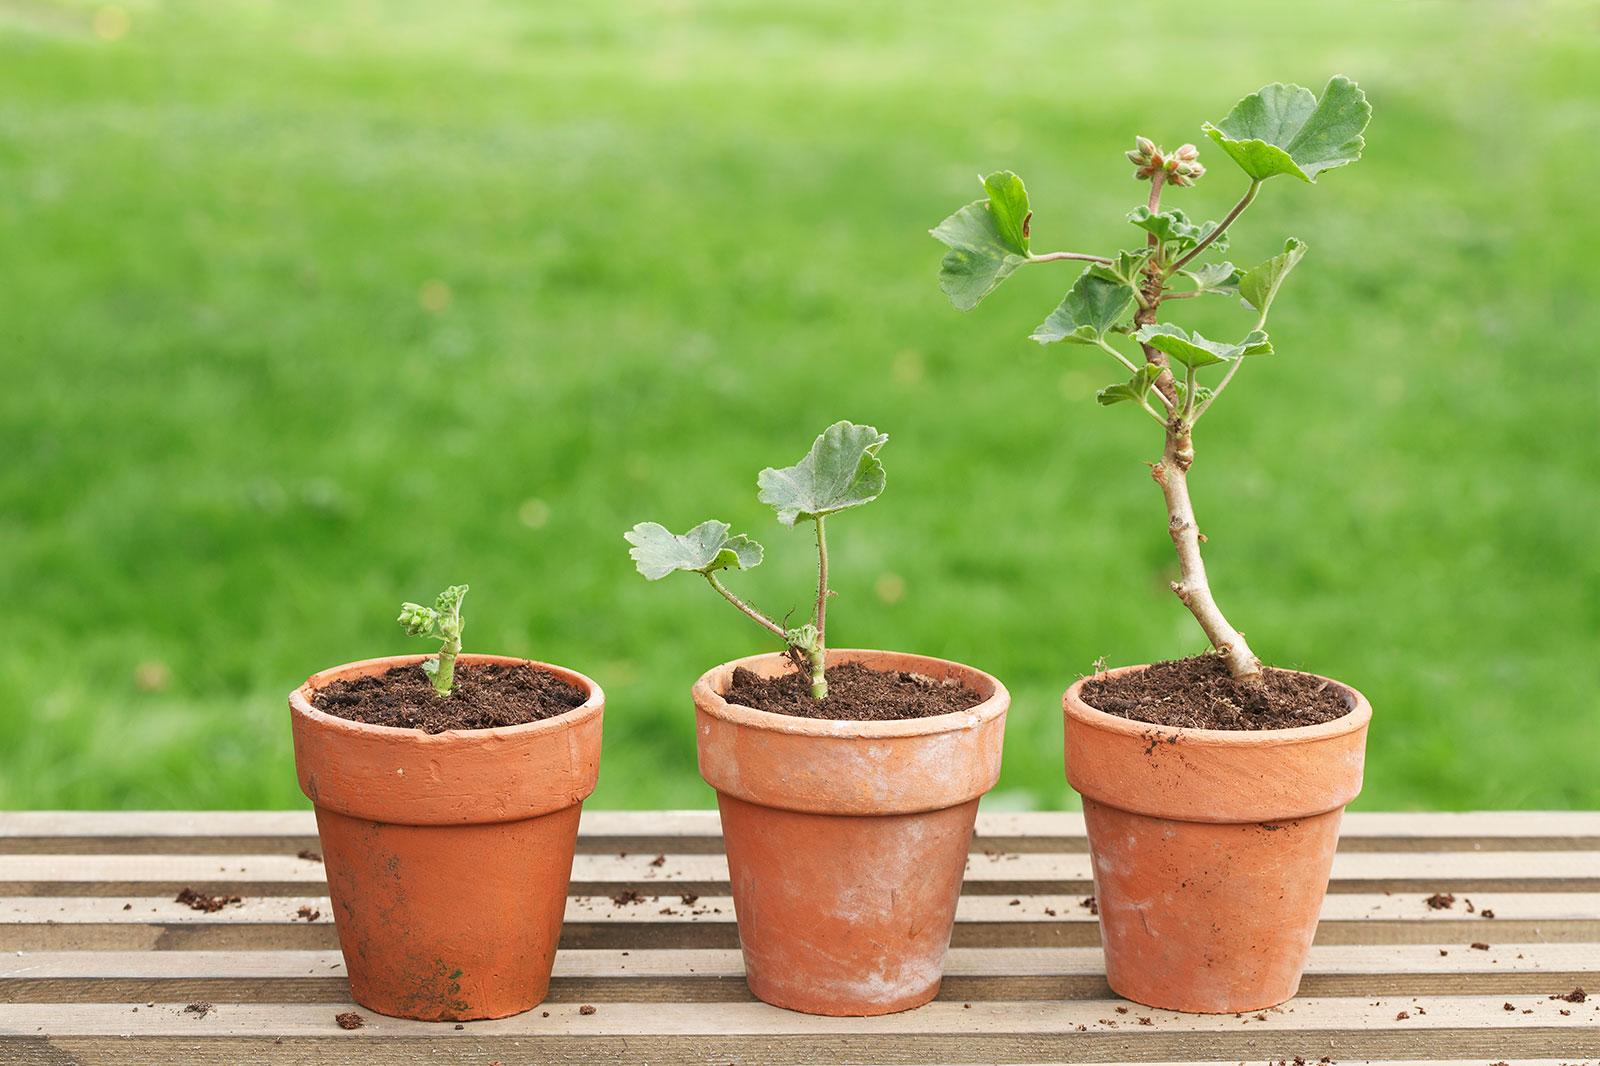 Repotting your indoor plants